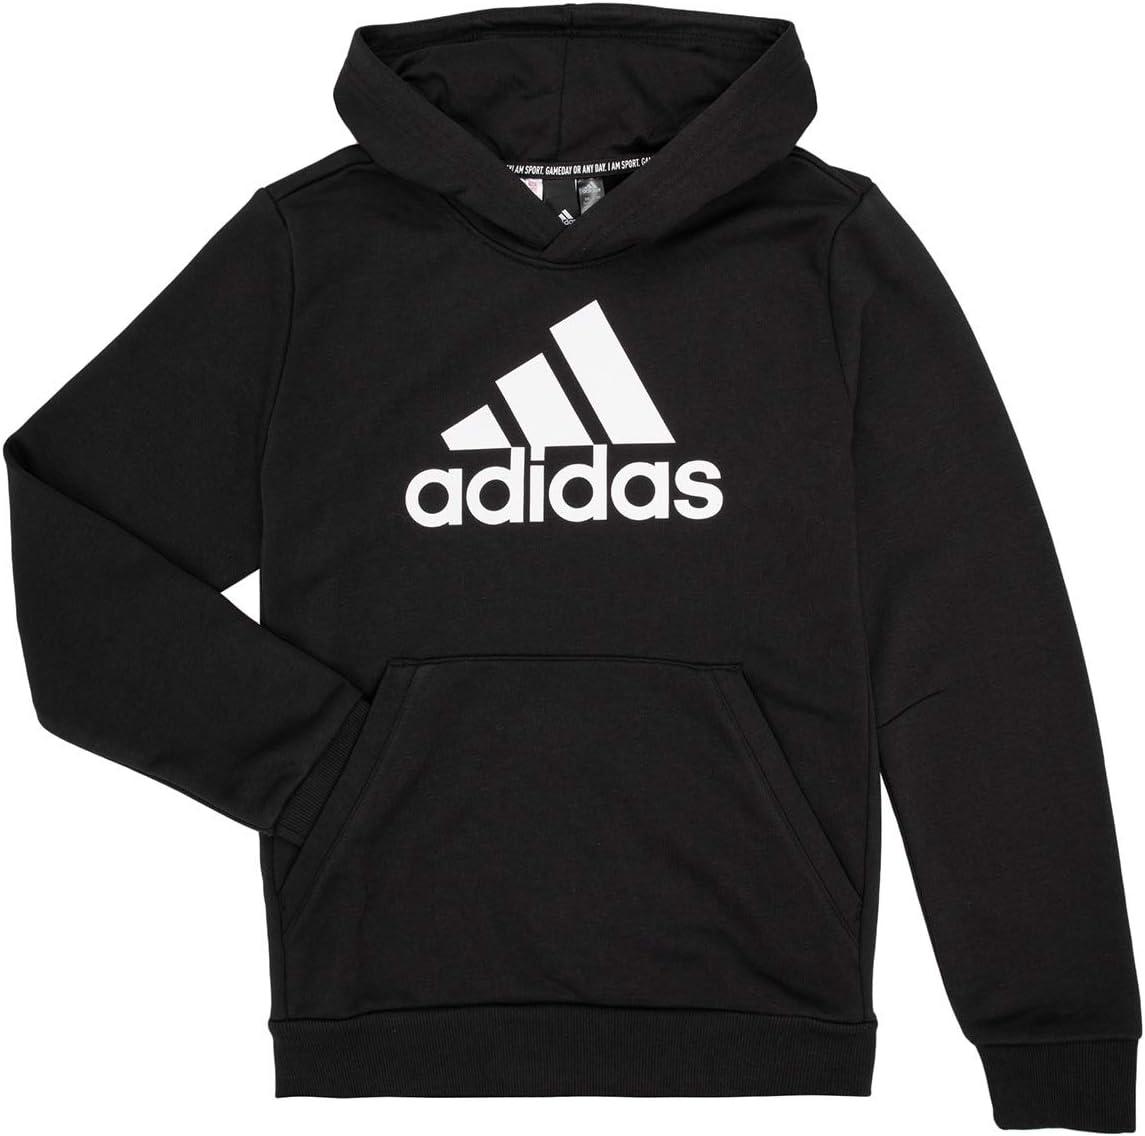 adidas Boys Mh Bos Po Sweatshirt